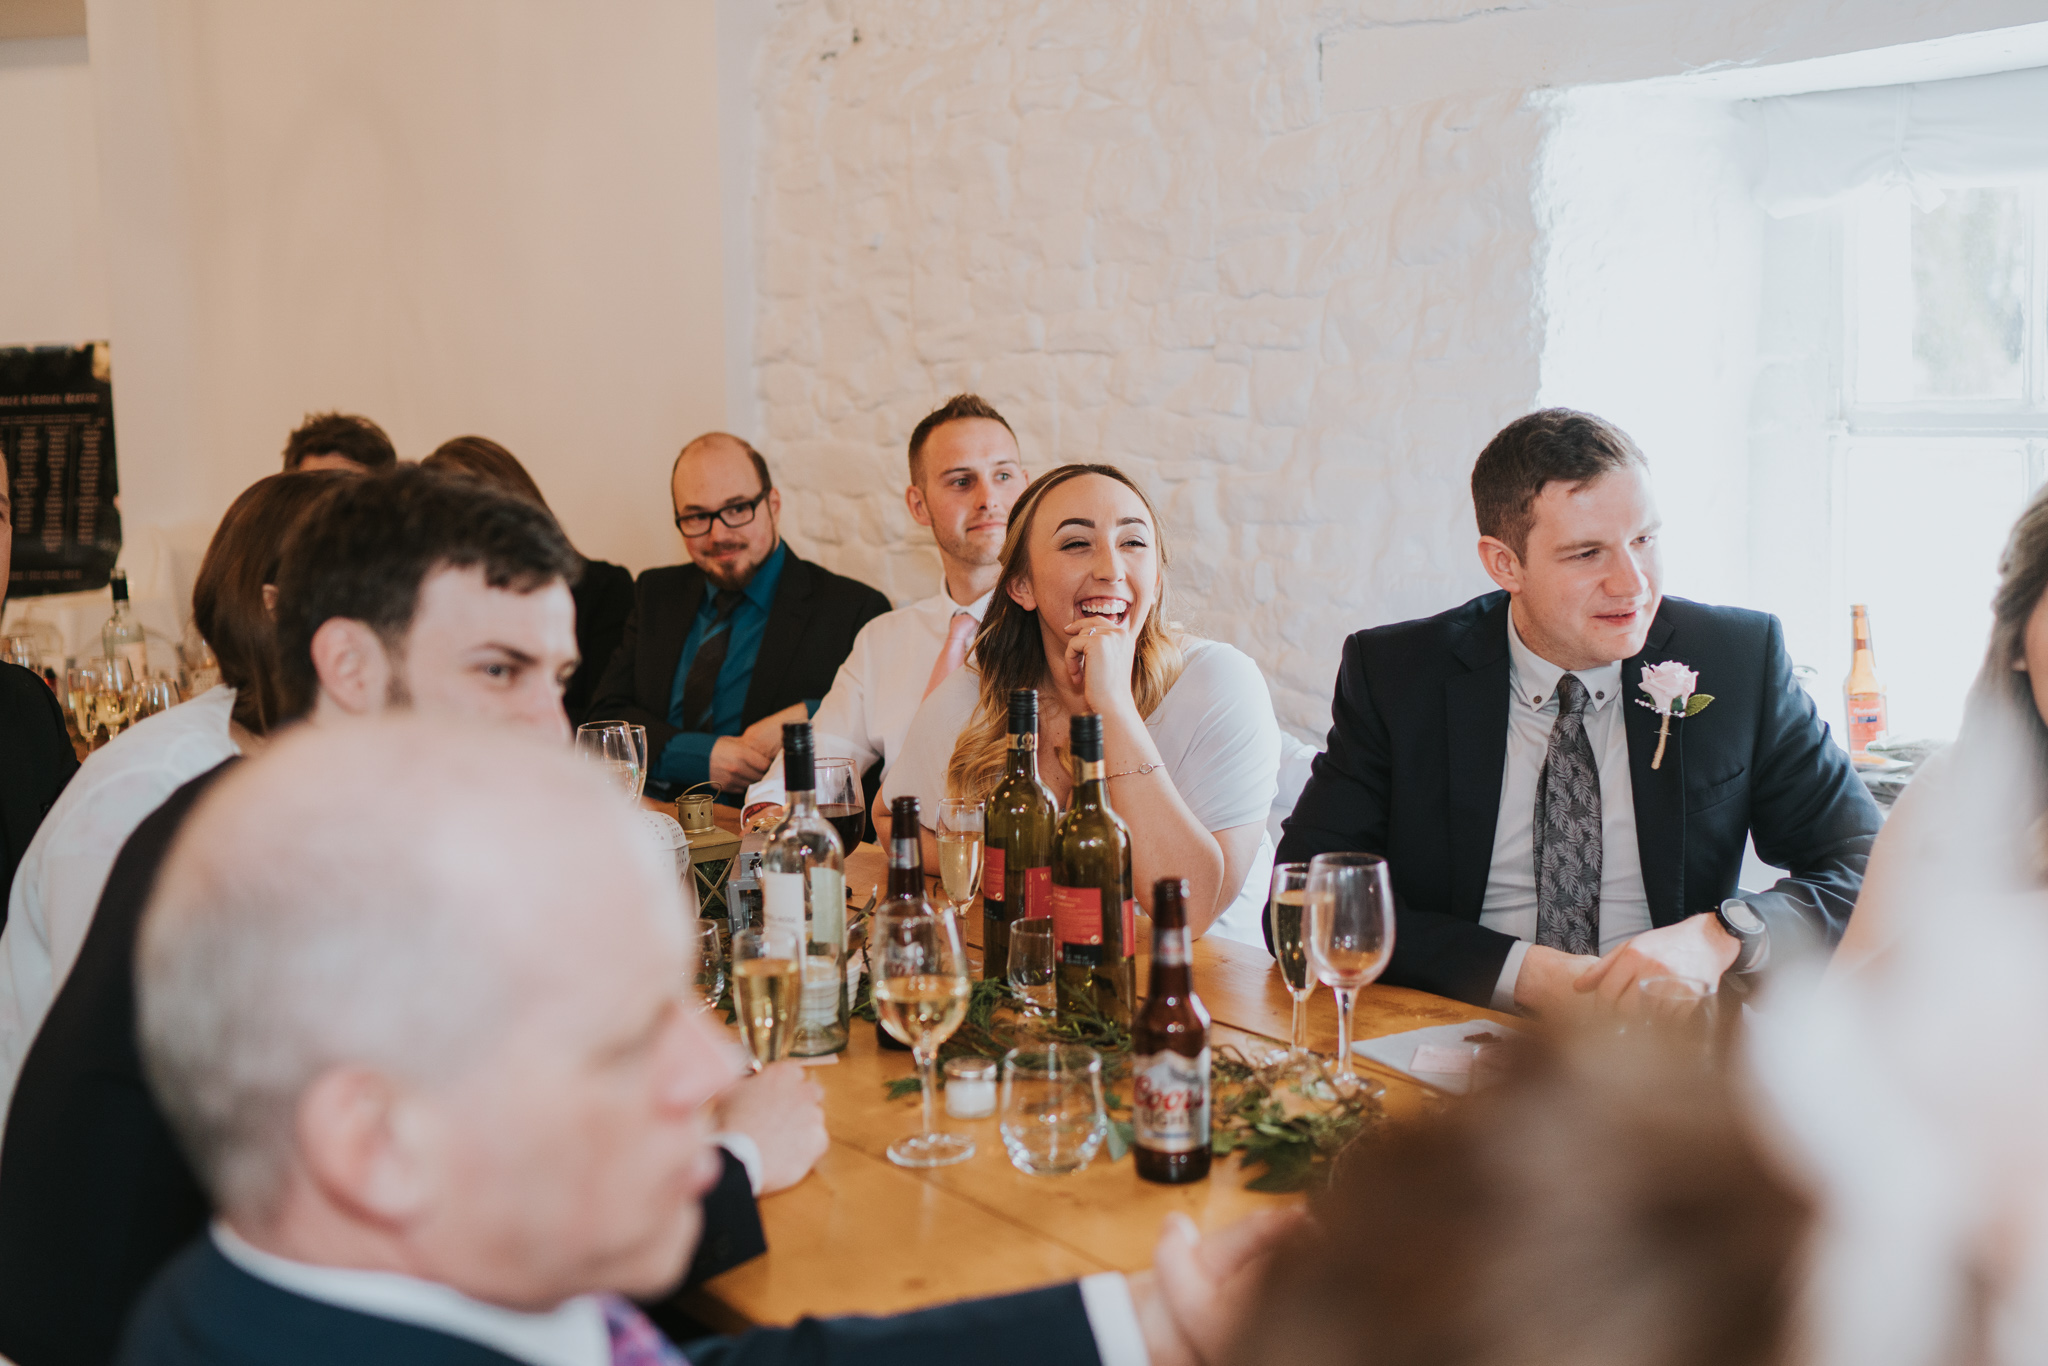 grace-sam-old-barn-clovelly-devon-wedding-photographer-grace-elizabeth-essex-suffolk-norfolk-wedding-photographer (87 of 132).jpg